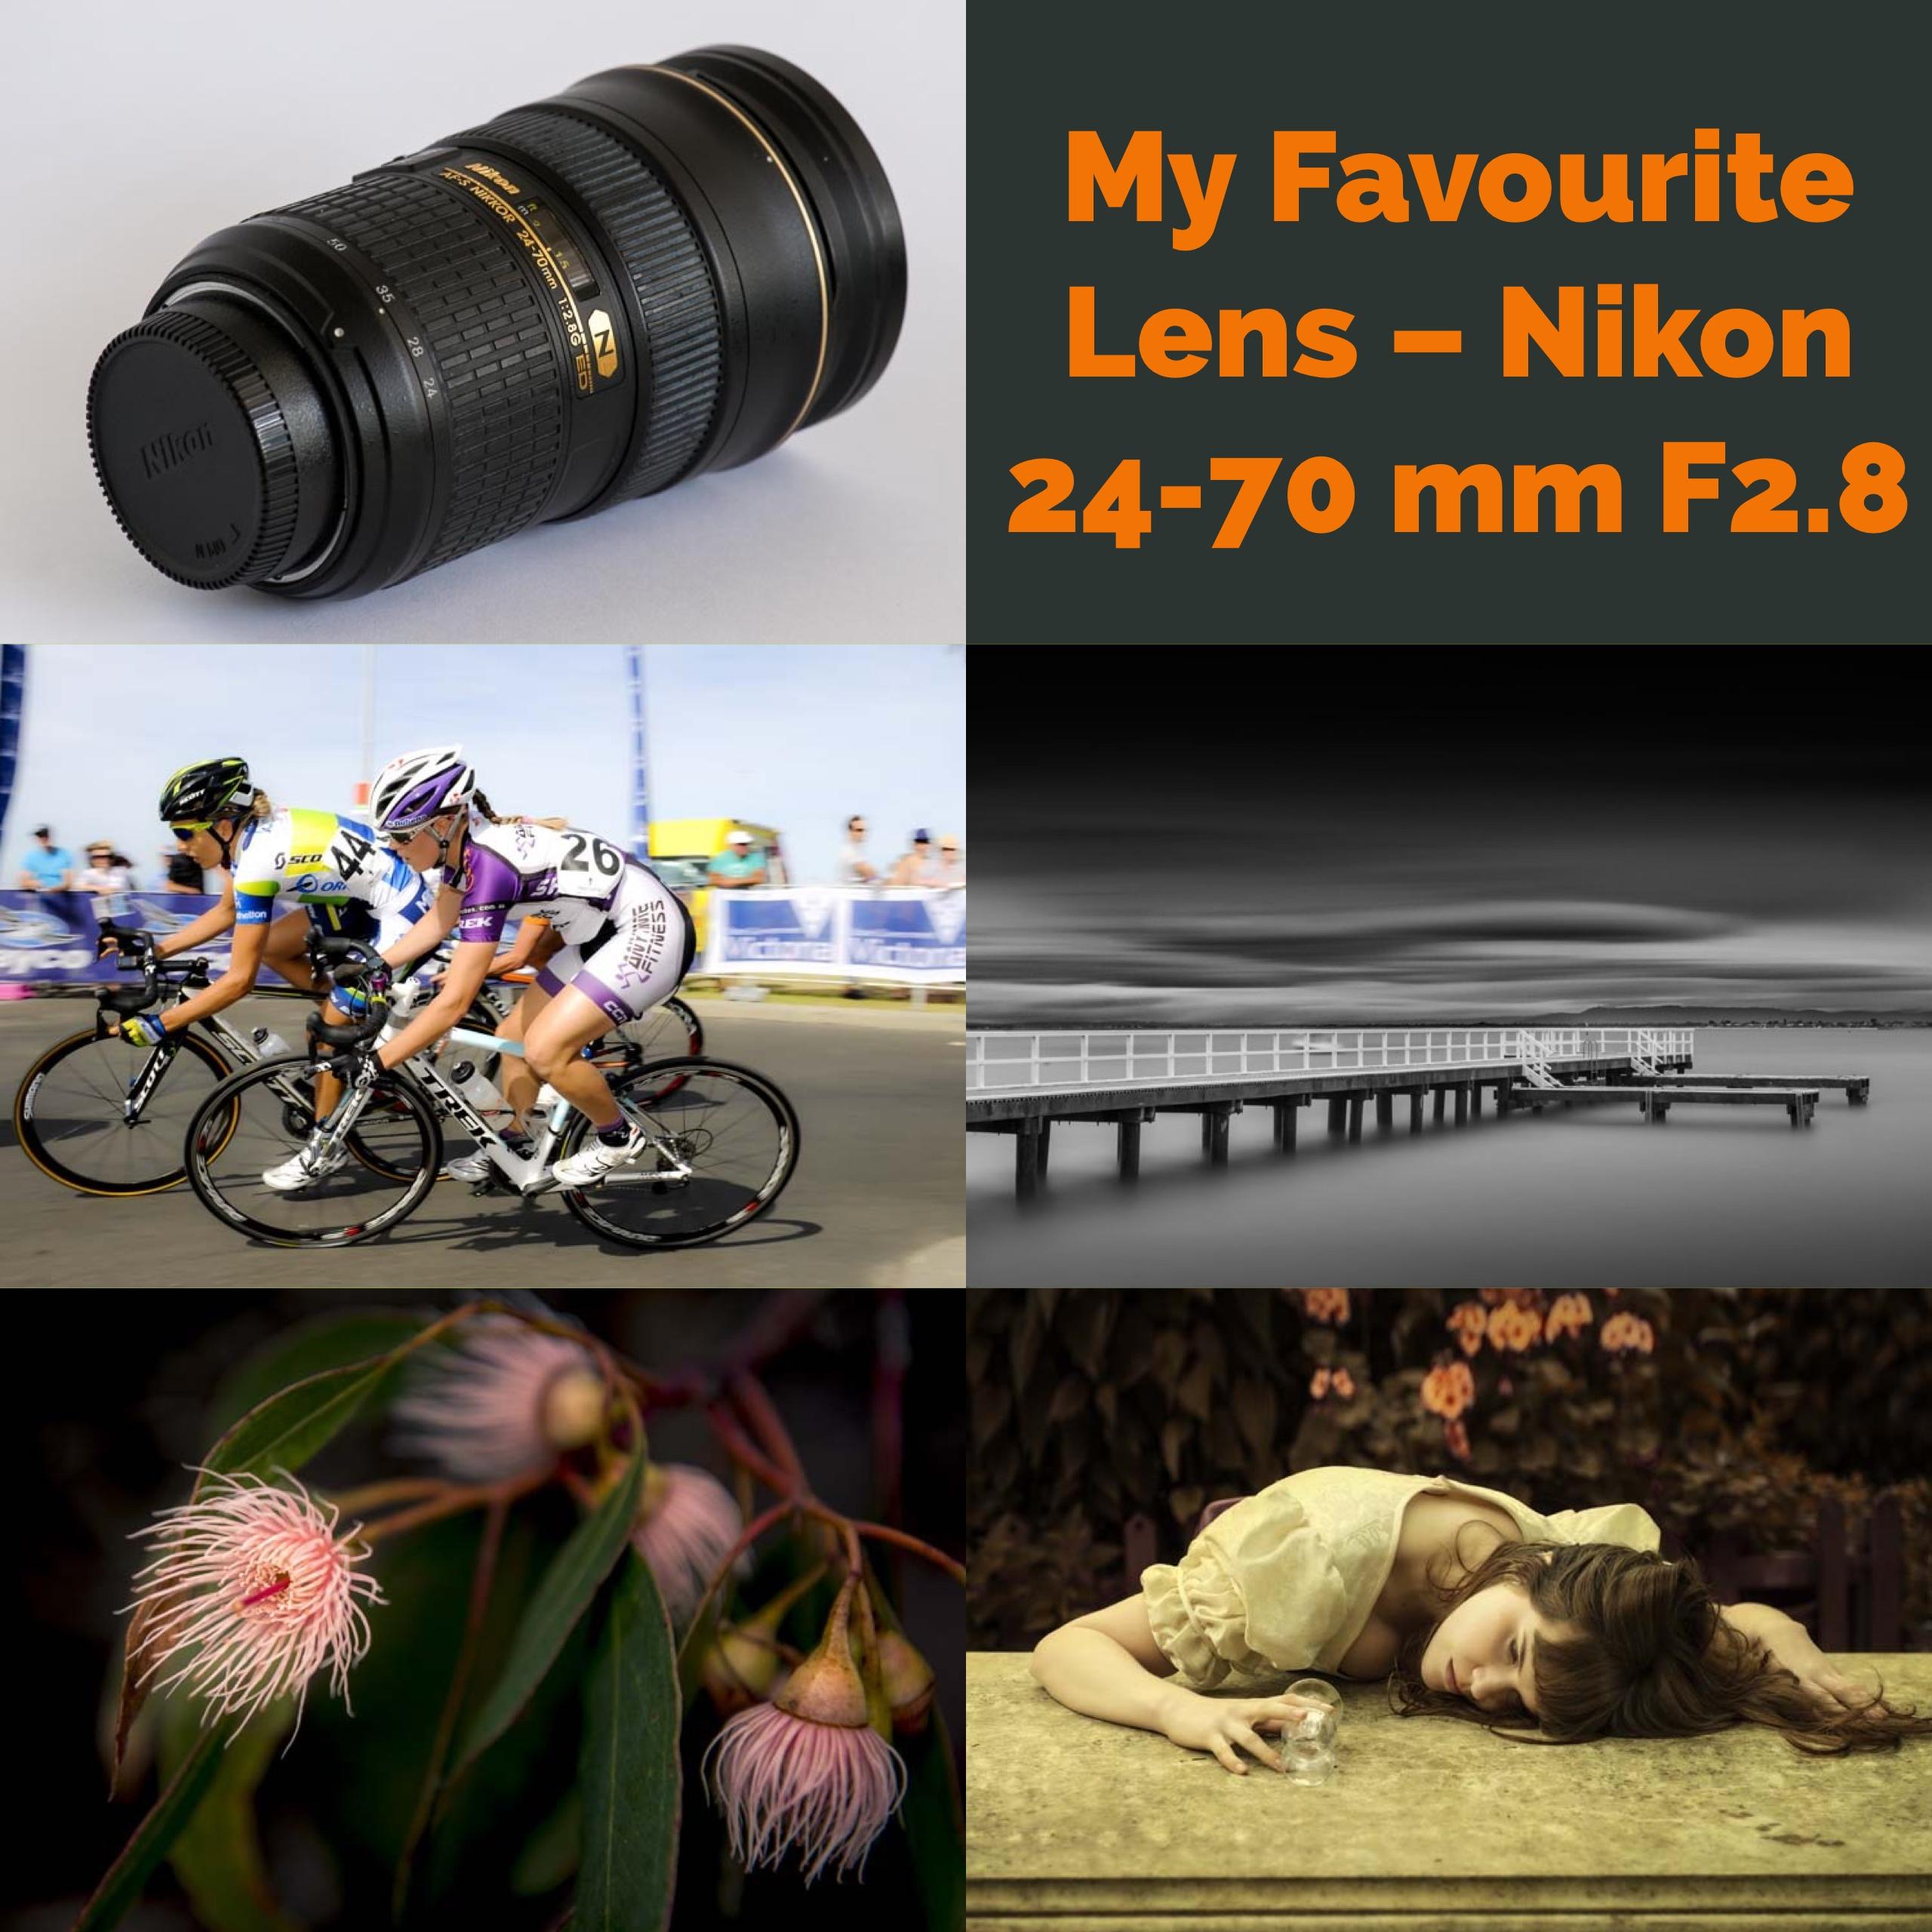 Writer's Favourite Lens – Nikon 24-70 mm F2.8